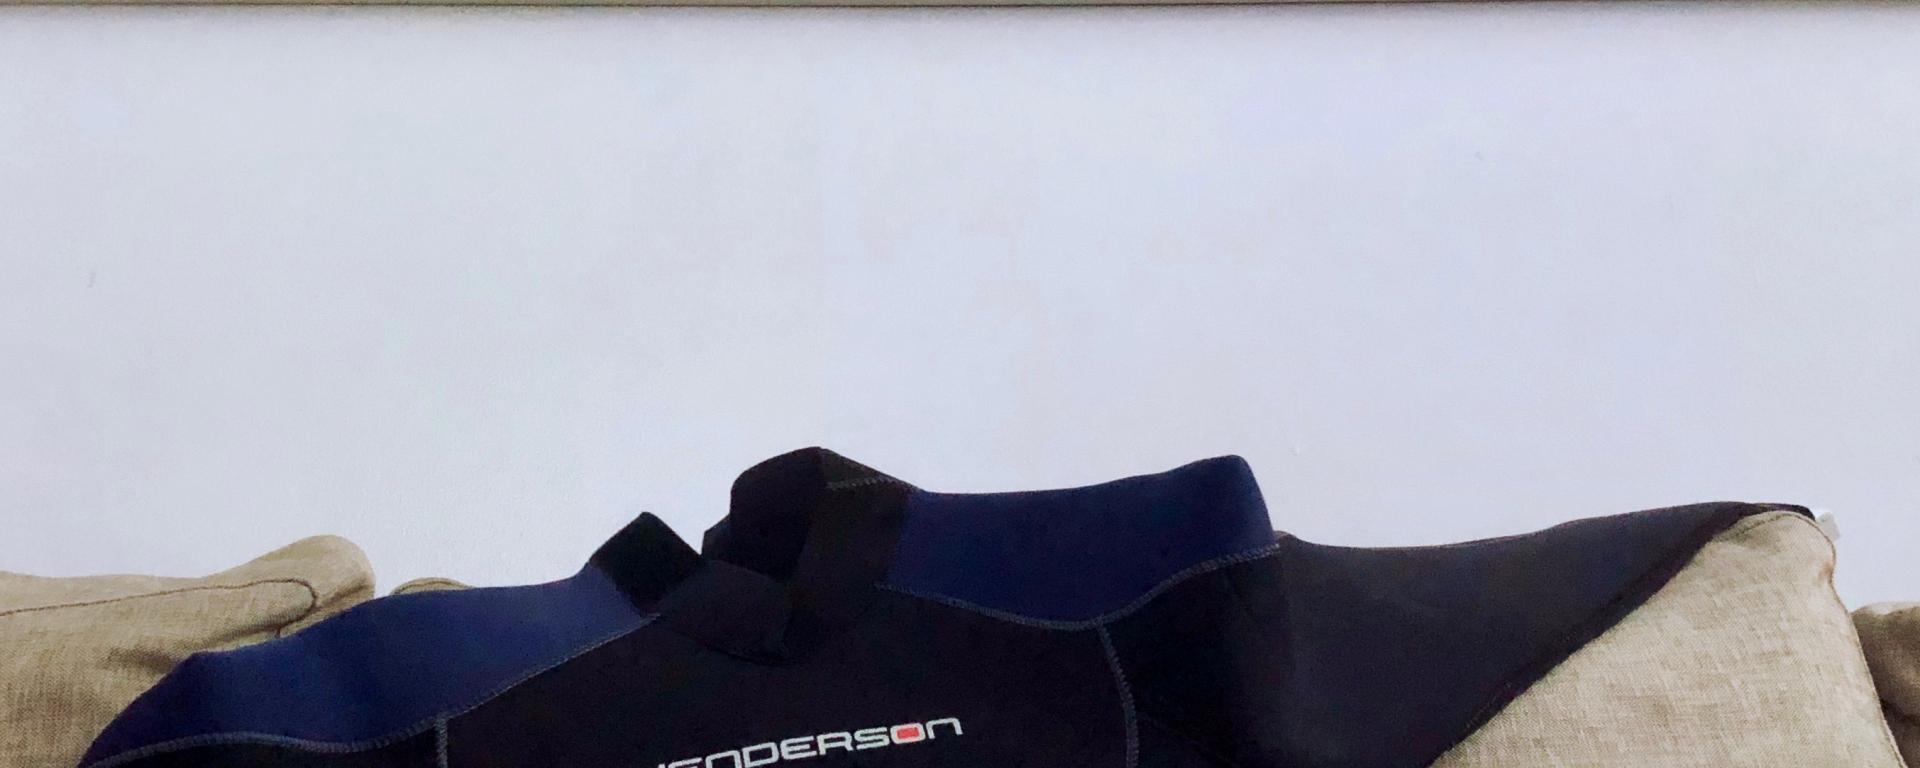 Henderson Wet Suit